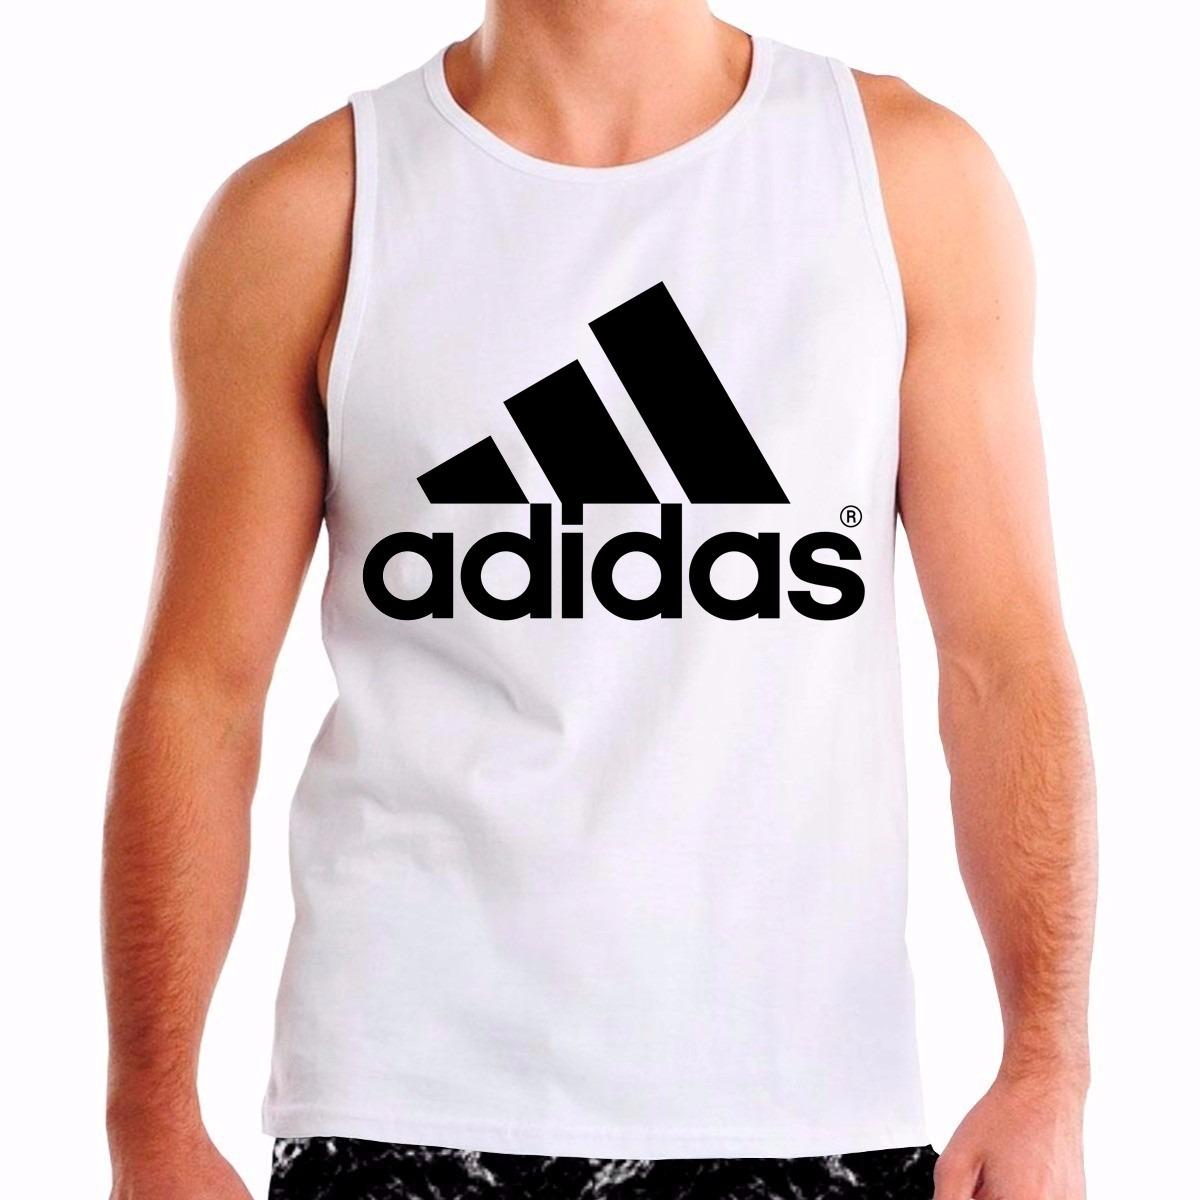 camiseta adidas regata personalizada logo símbolo camisa. Carregando zoom. d8c8a81758f10